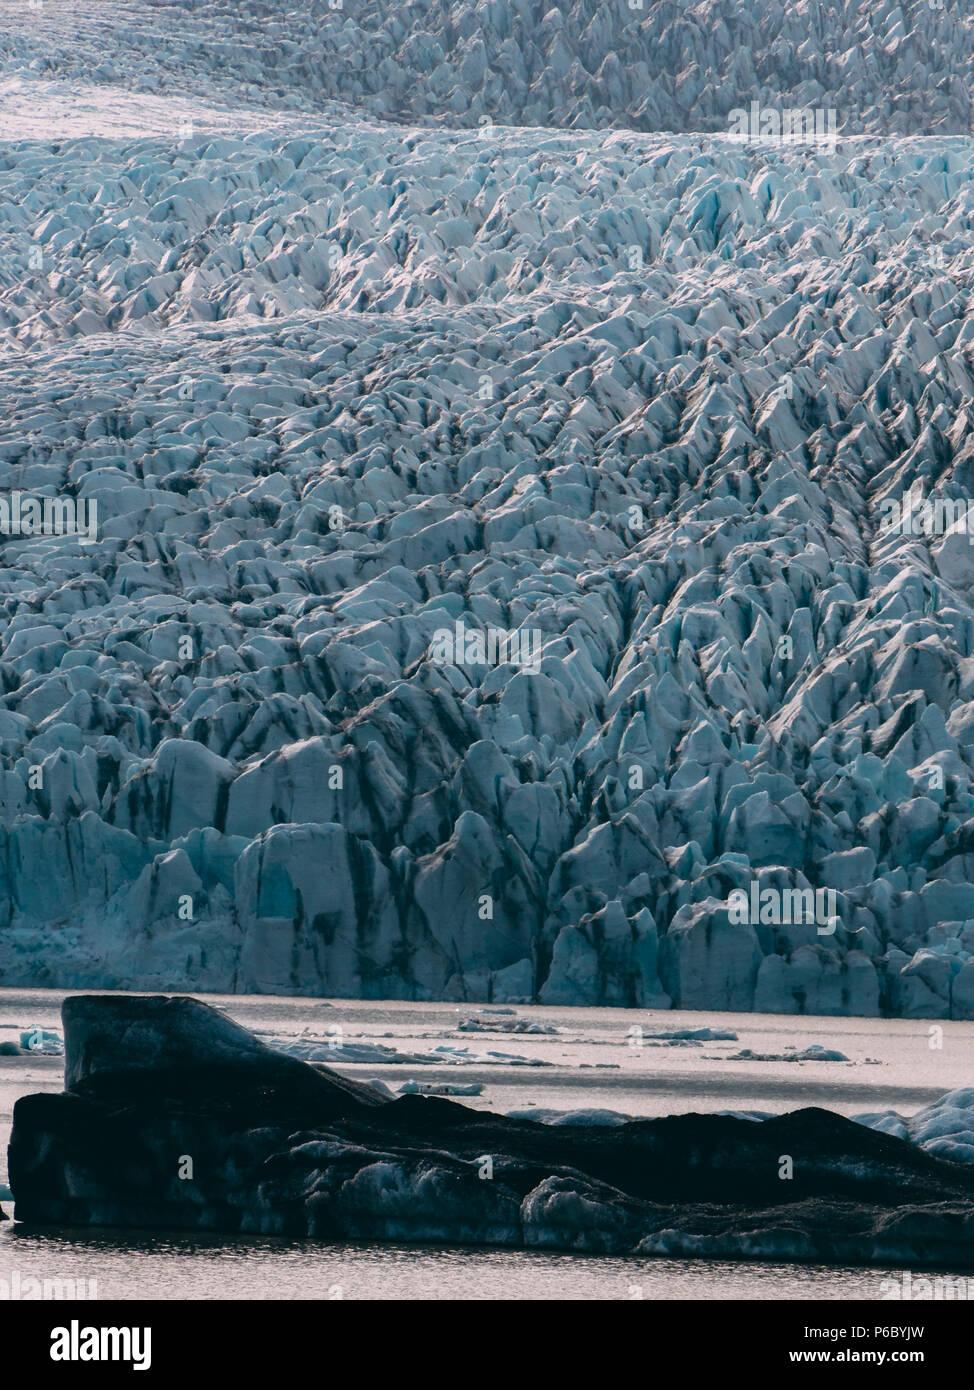 glacier lagoon in iceland. jokulsarlon lagoon beautfiul shaped icebergs lake - Stock Image